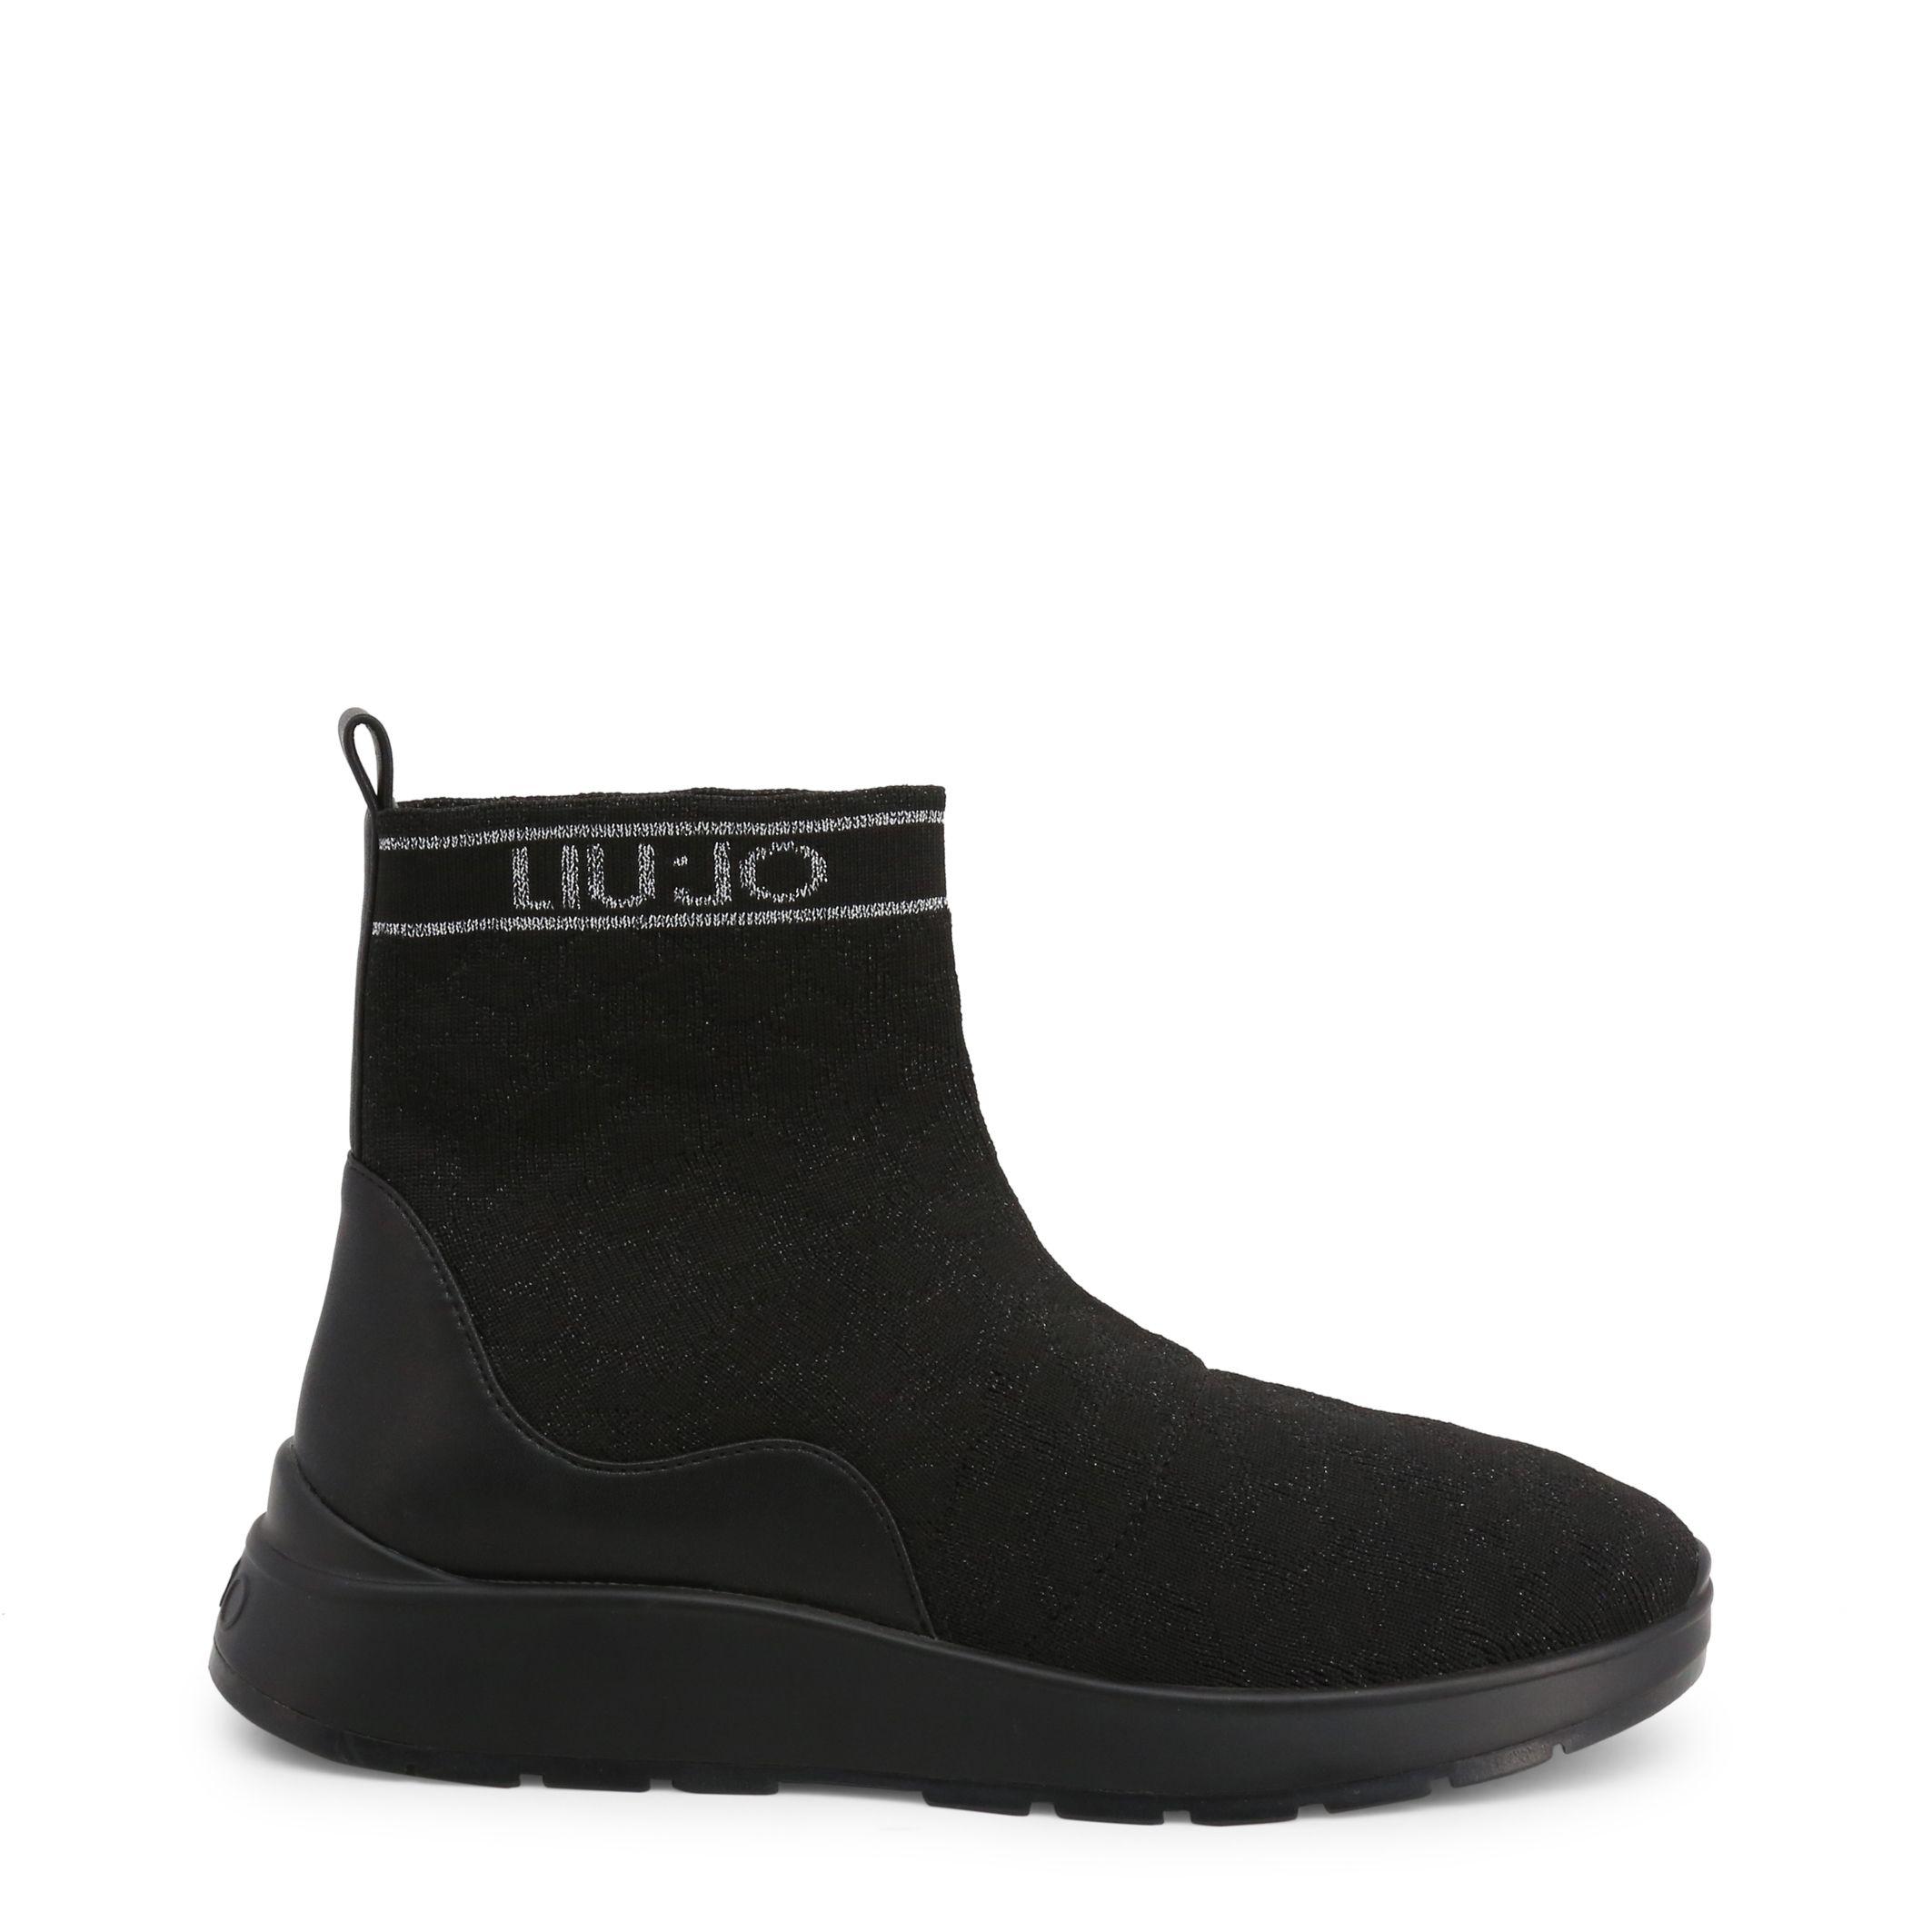 Schuhe Liu Jo – B69013TX022 – Schwarz